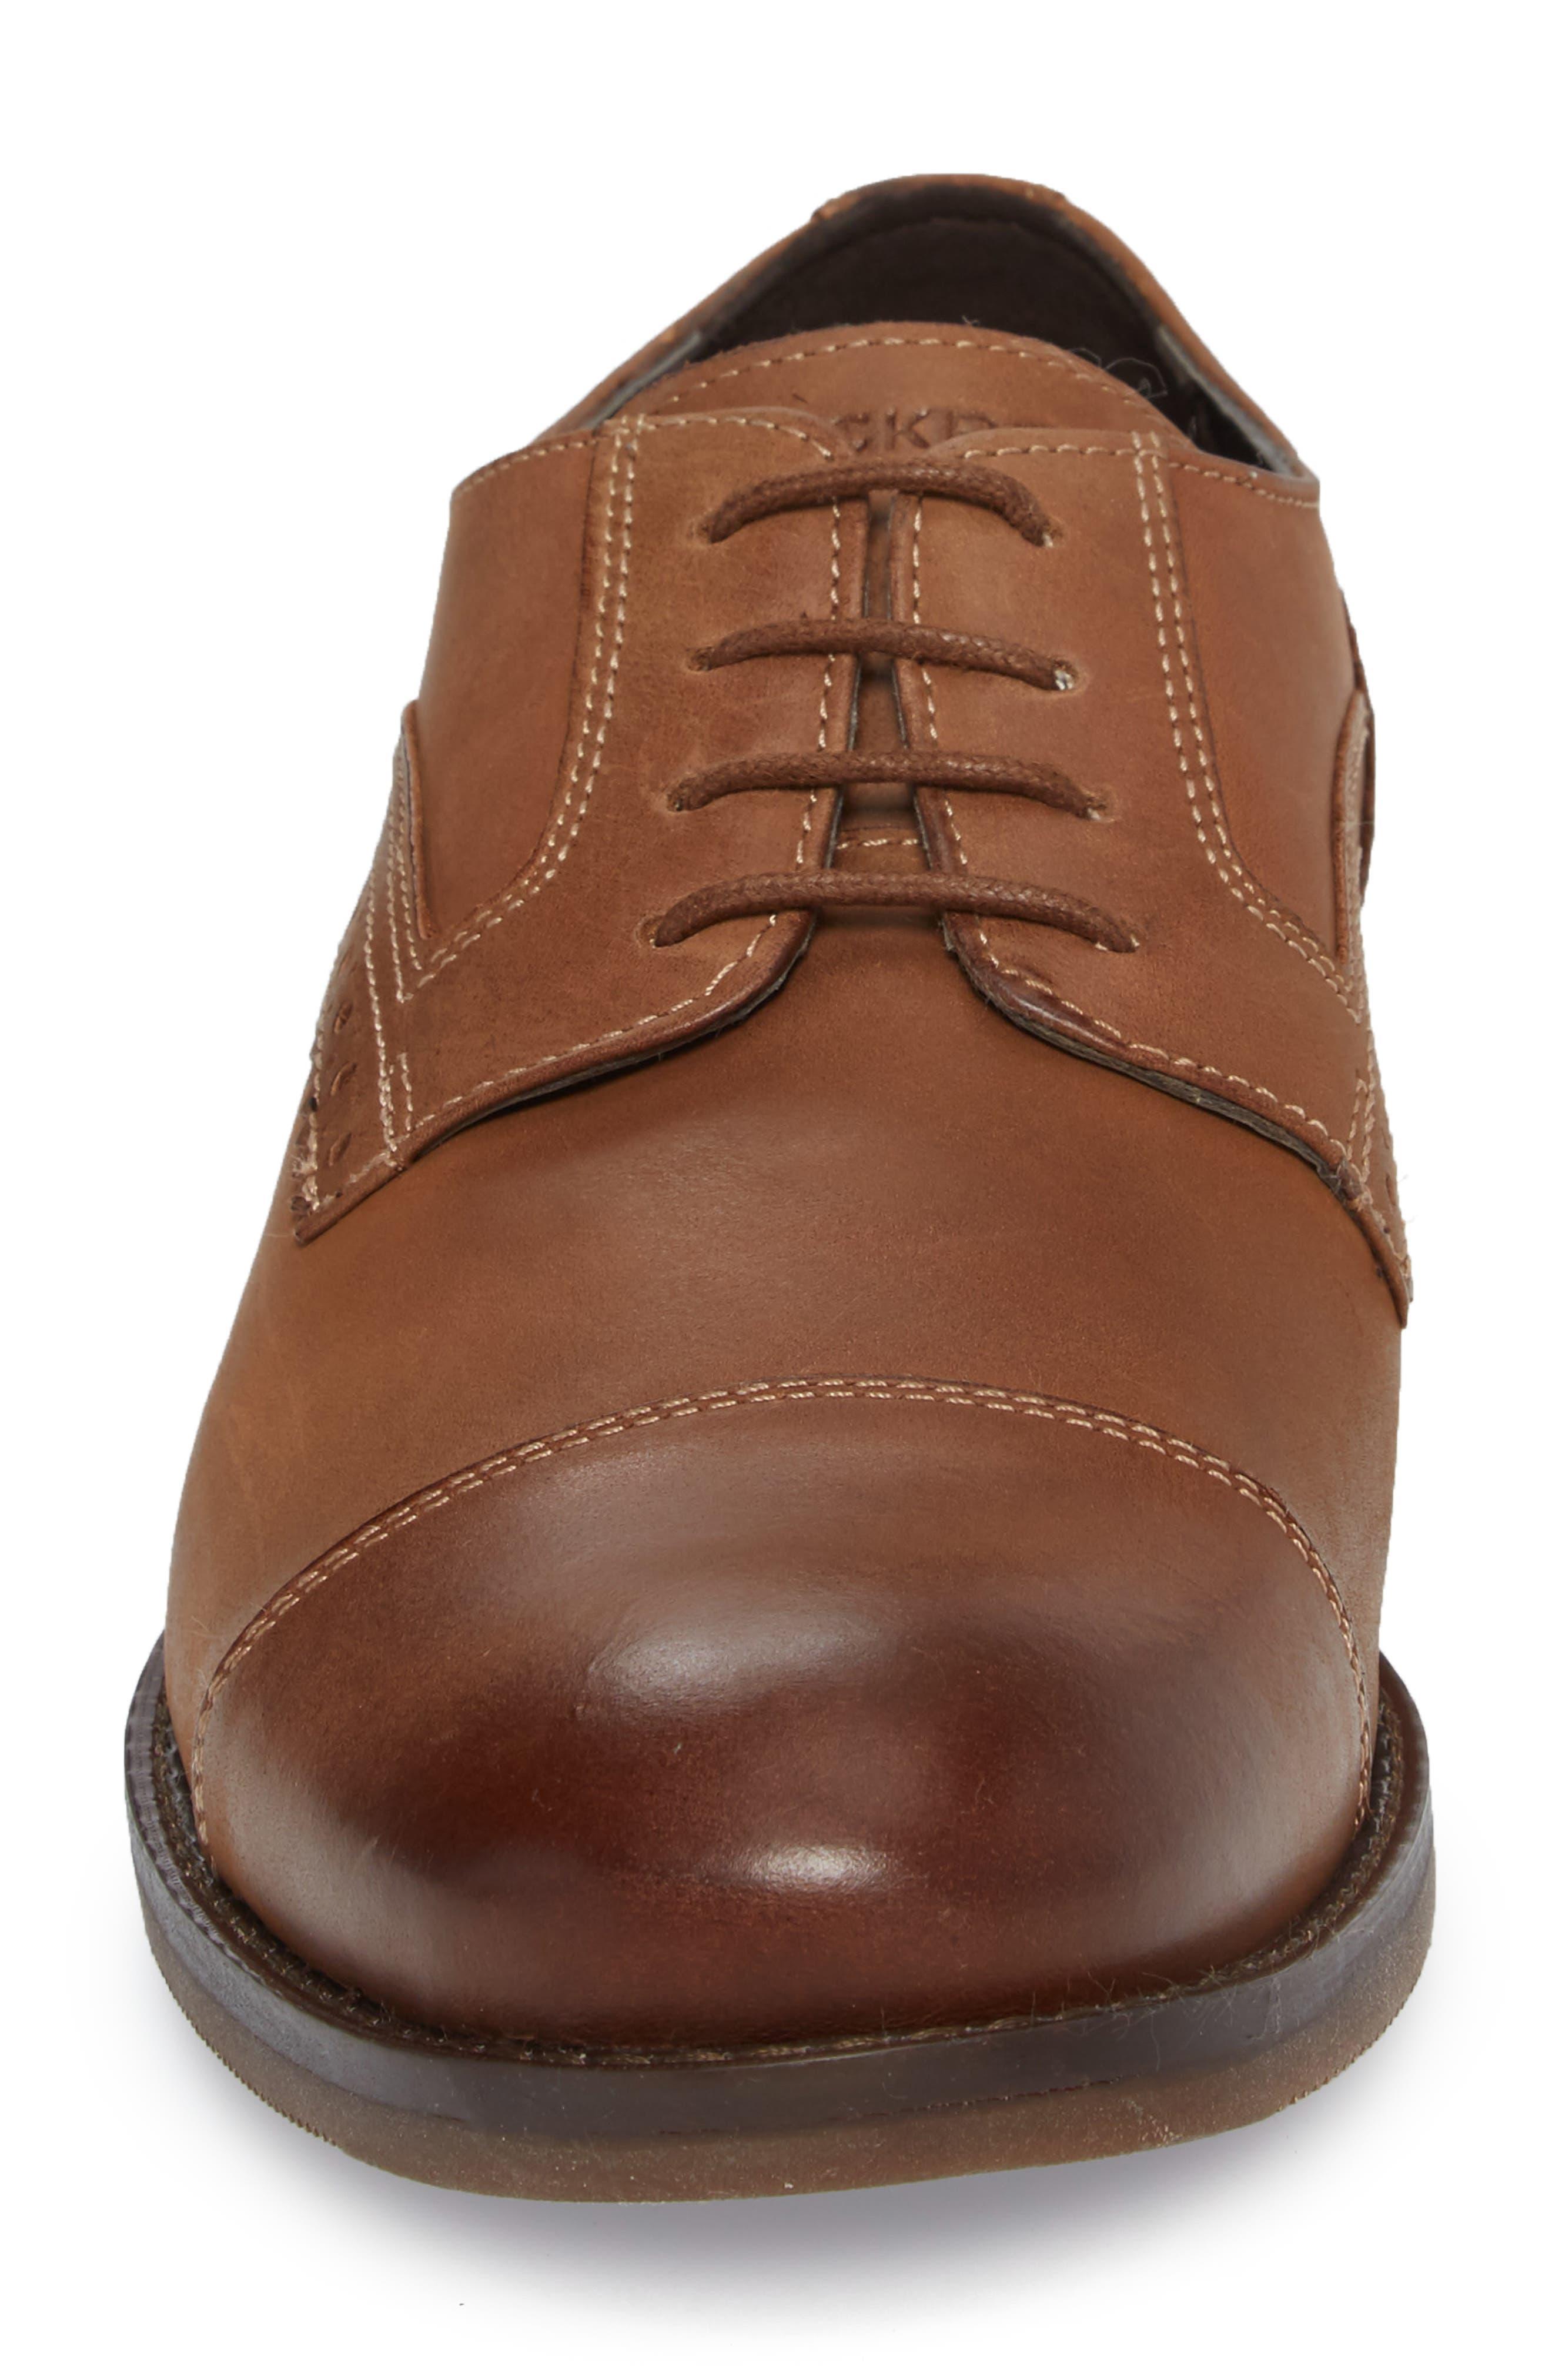 Wynston Cap Toe Blucher,                             Alternate thumbnail 4, color,                             Tobacco Leather